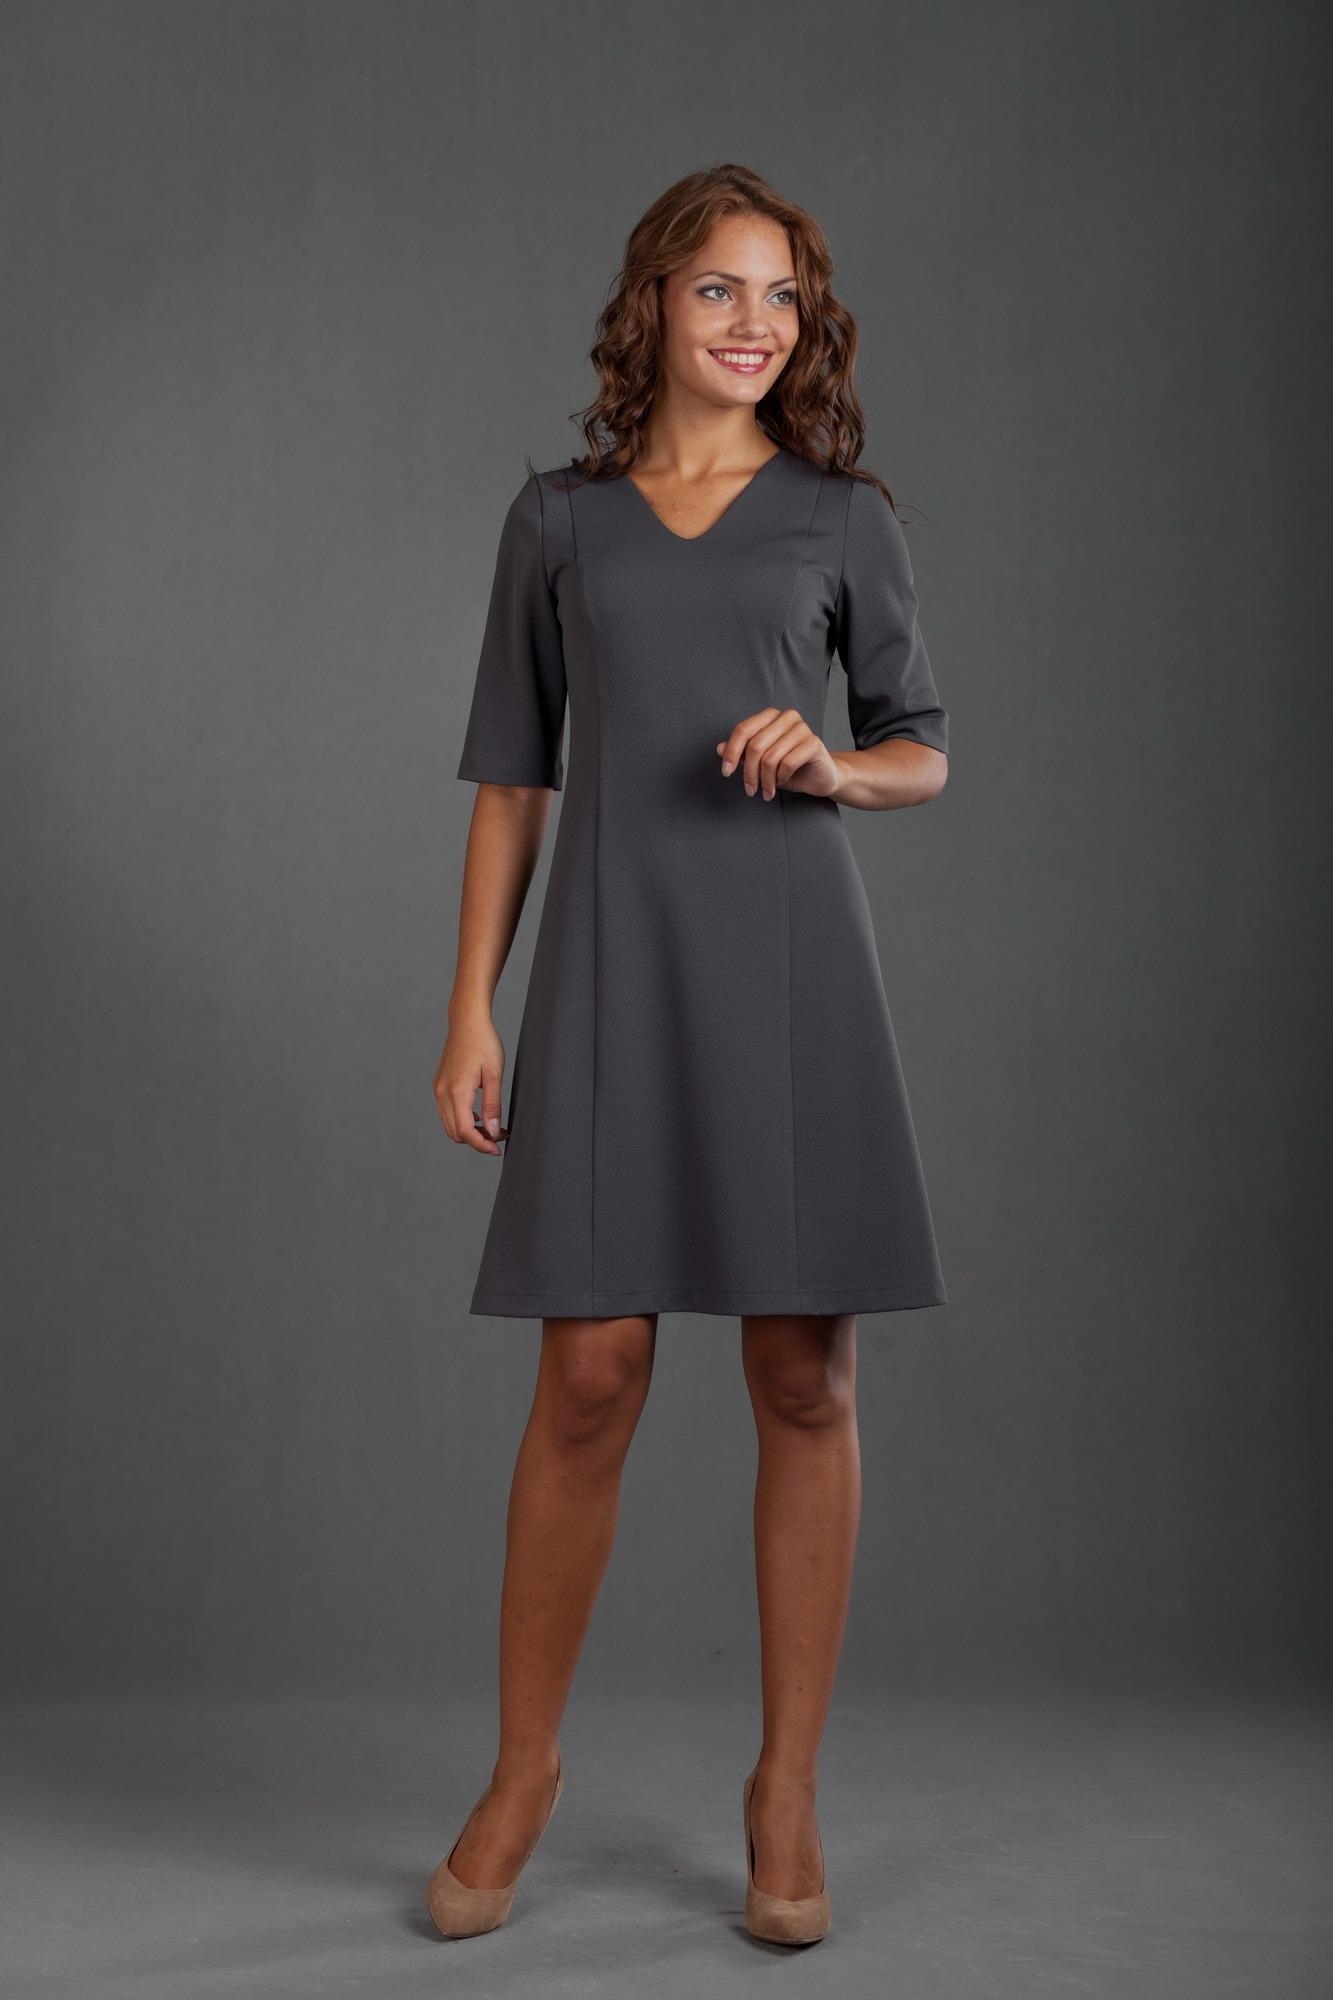 Фото платье трапеция с рукавами 4